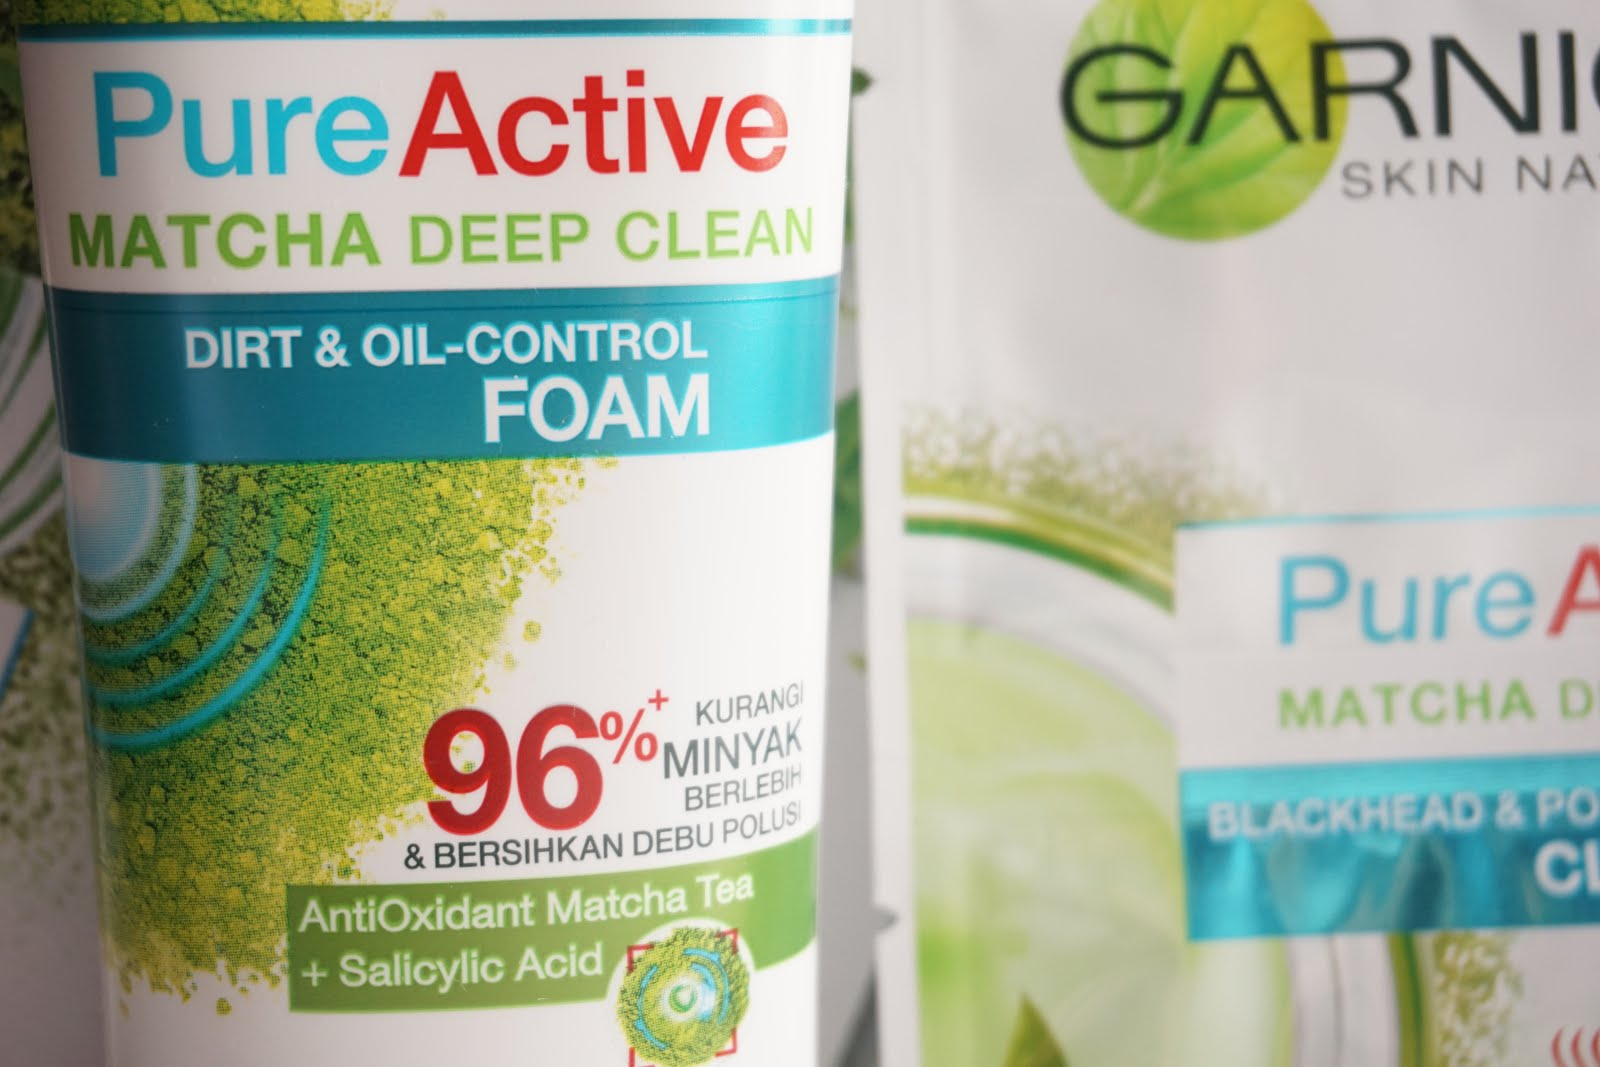 Jual Murah Garnier Pure Active Acne Oil Clearing 100ml Terbaru 2018 Matcha Deep Clean 50ml Series Stevie Wong Each Tube Consist Of 100